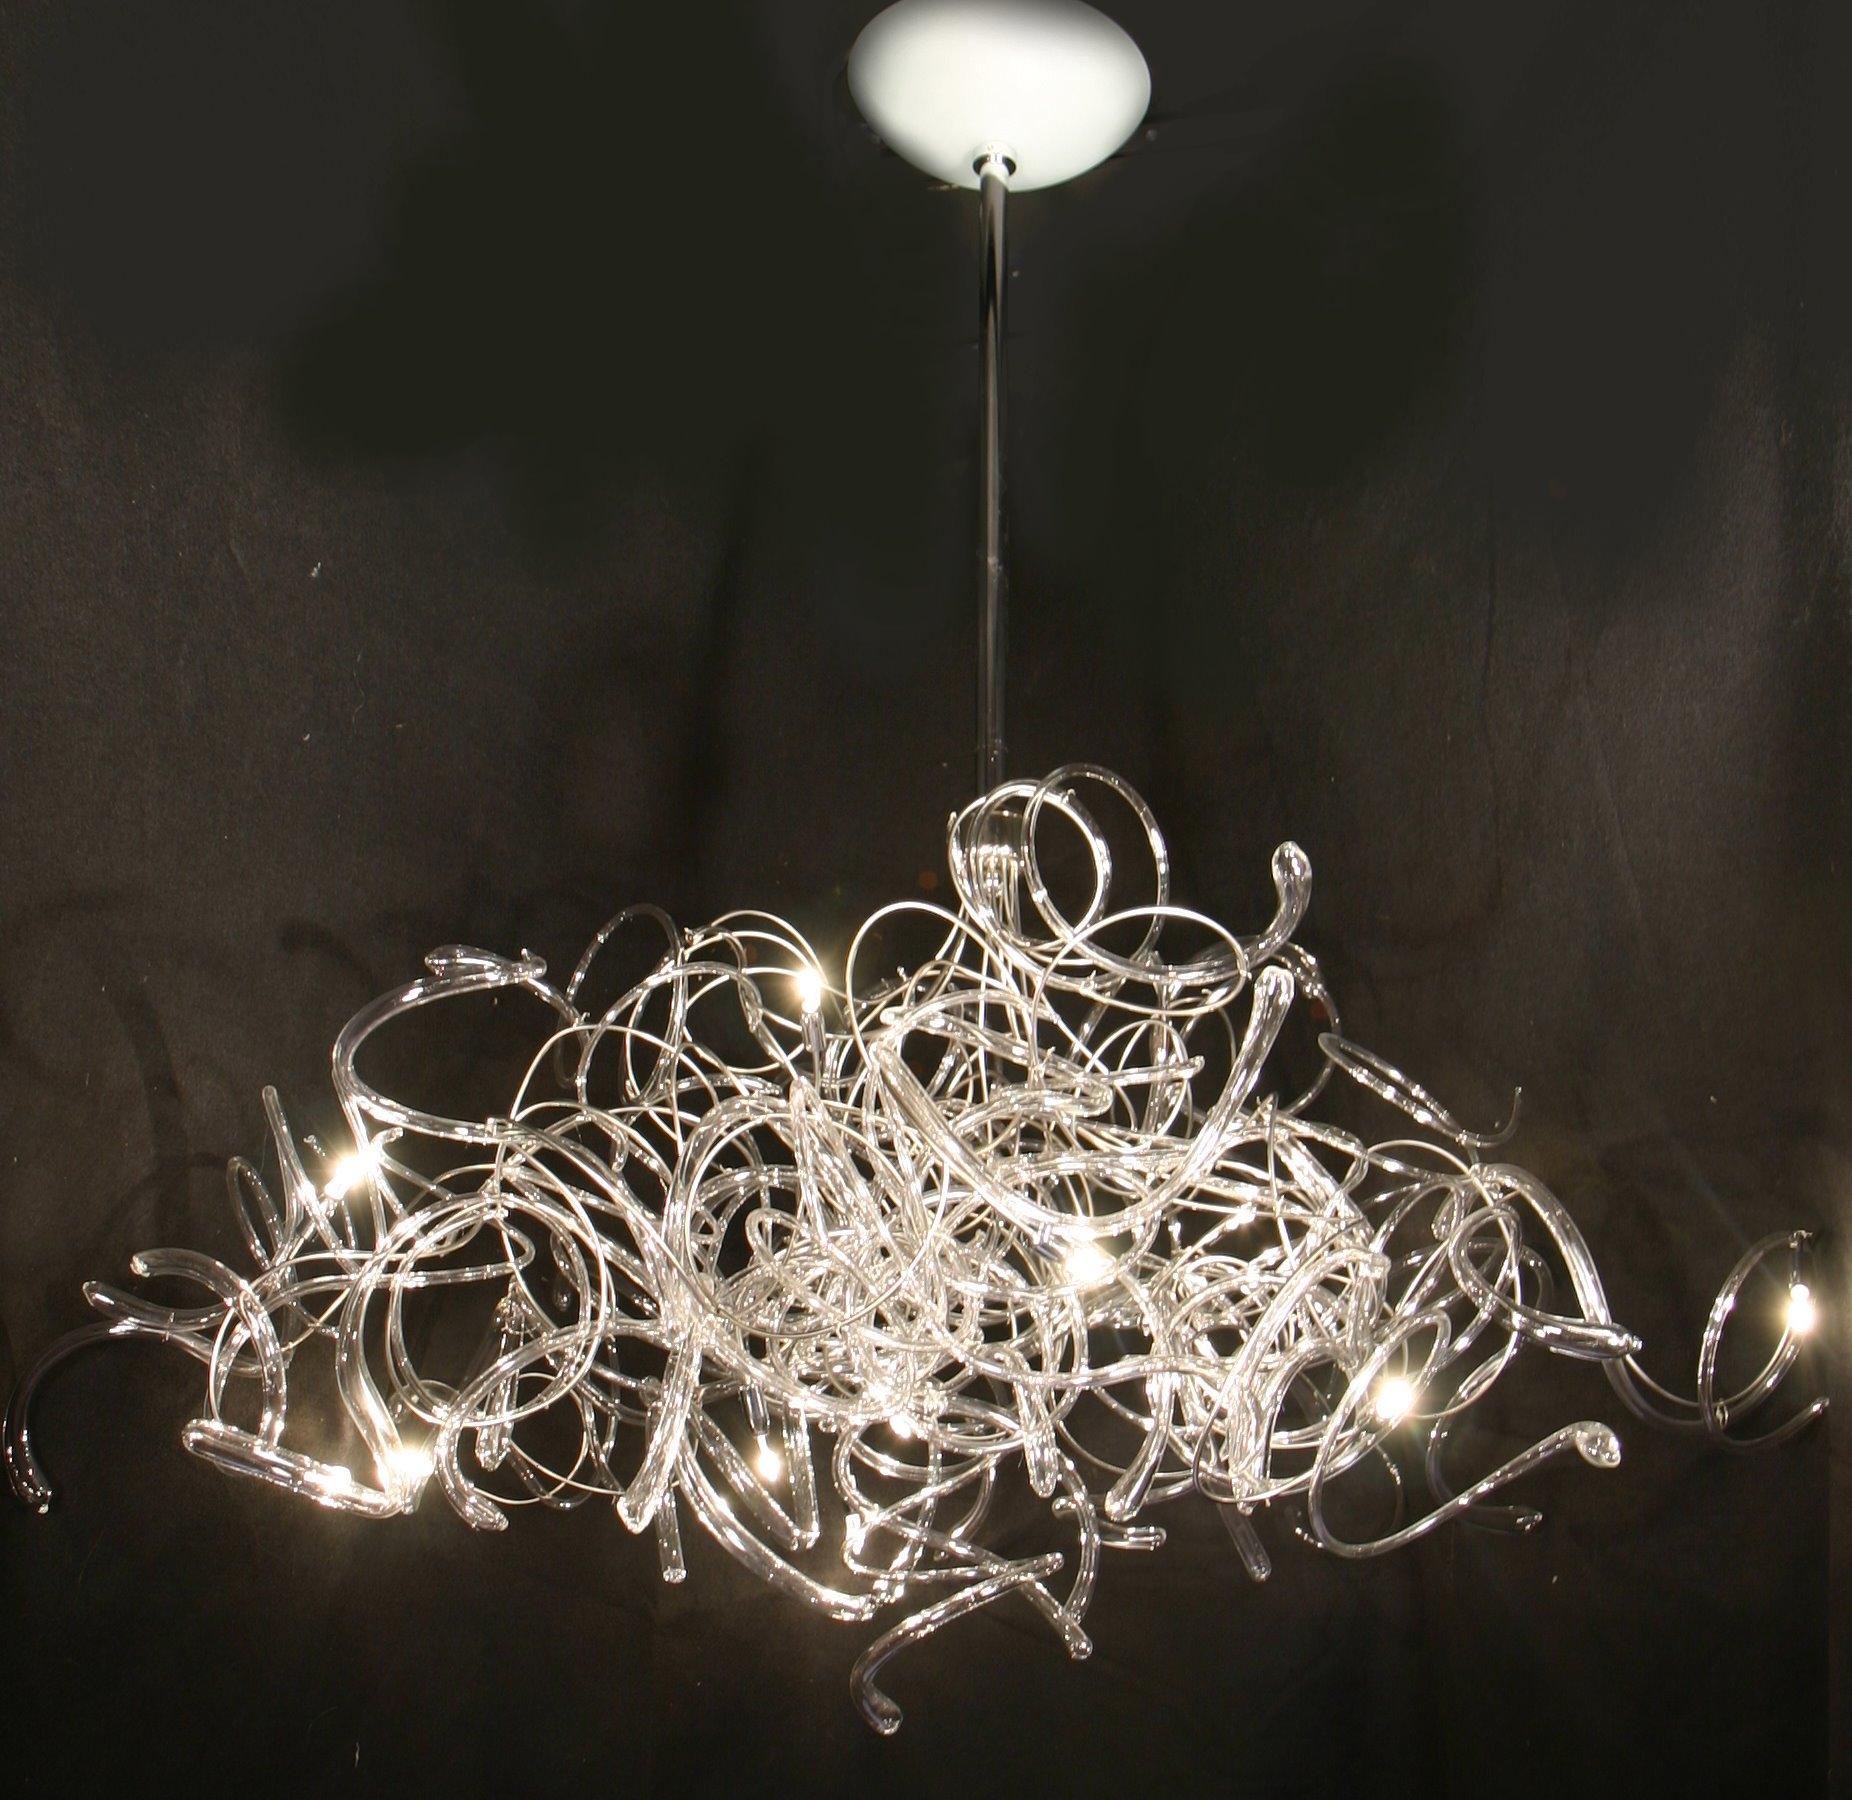 Contemporary Lighting Chandeliers Regarding Contemporary Chandelier (#10 of 12)